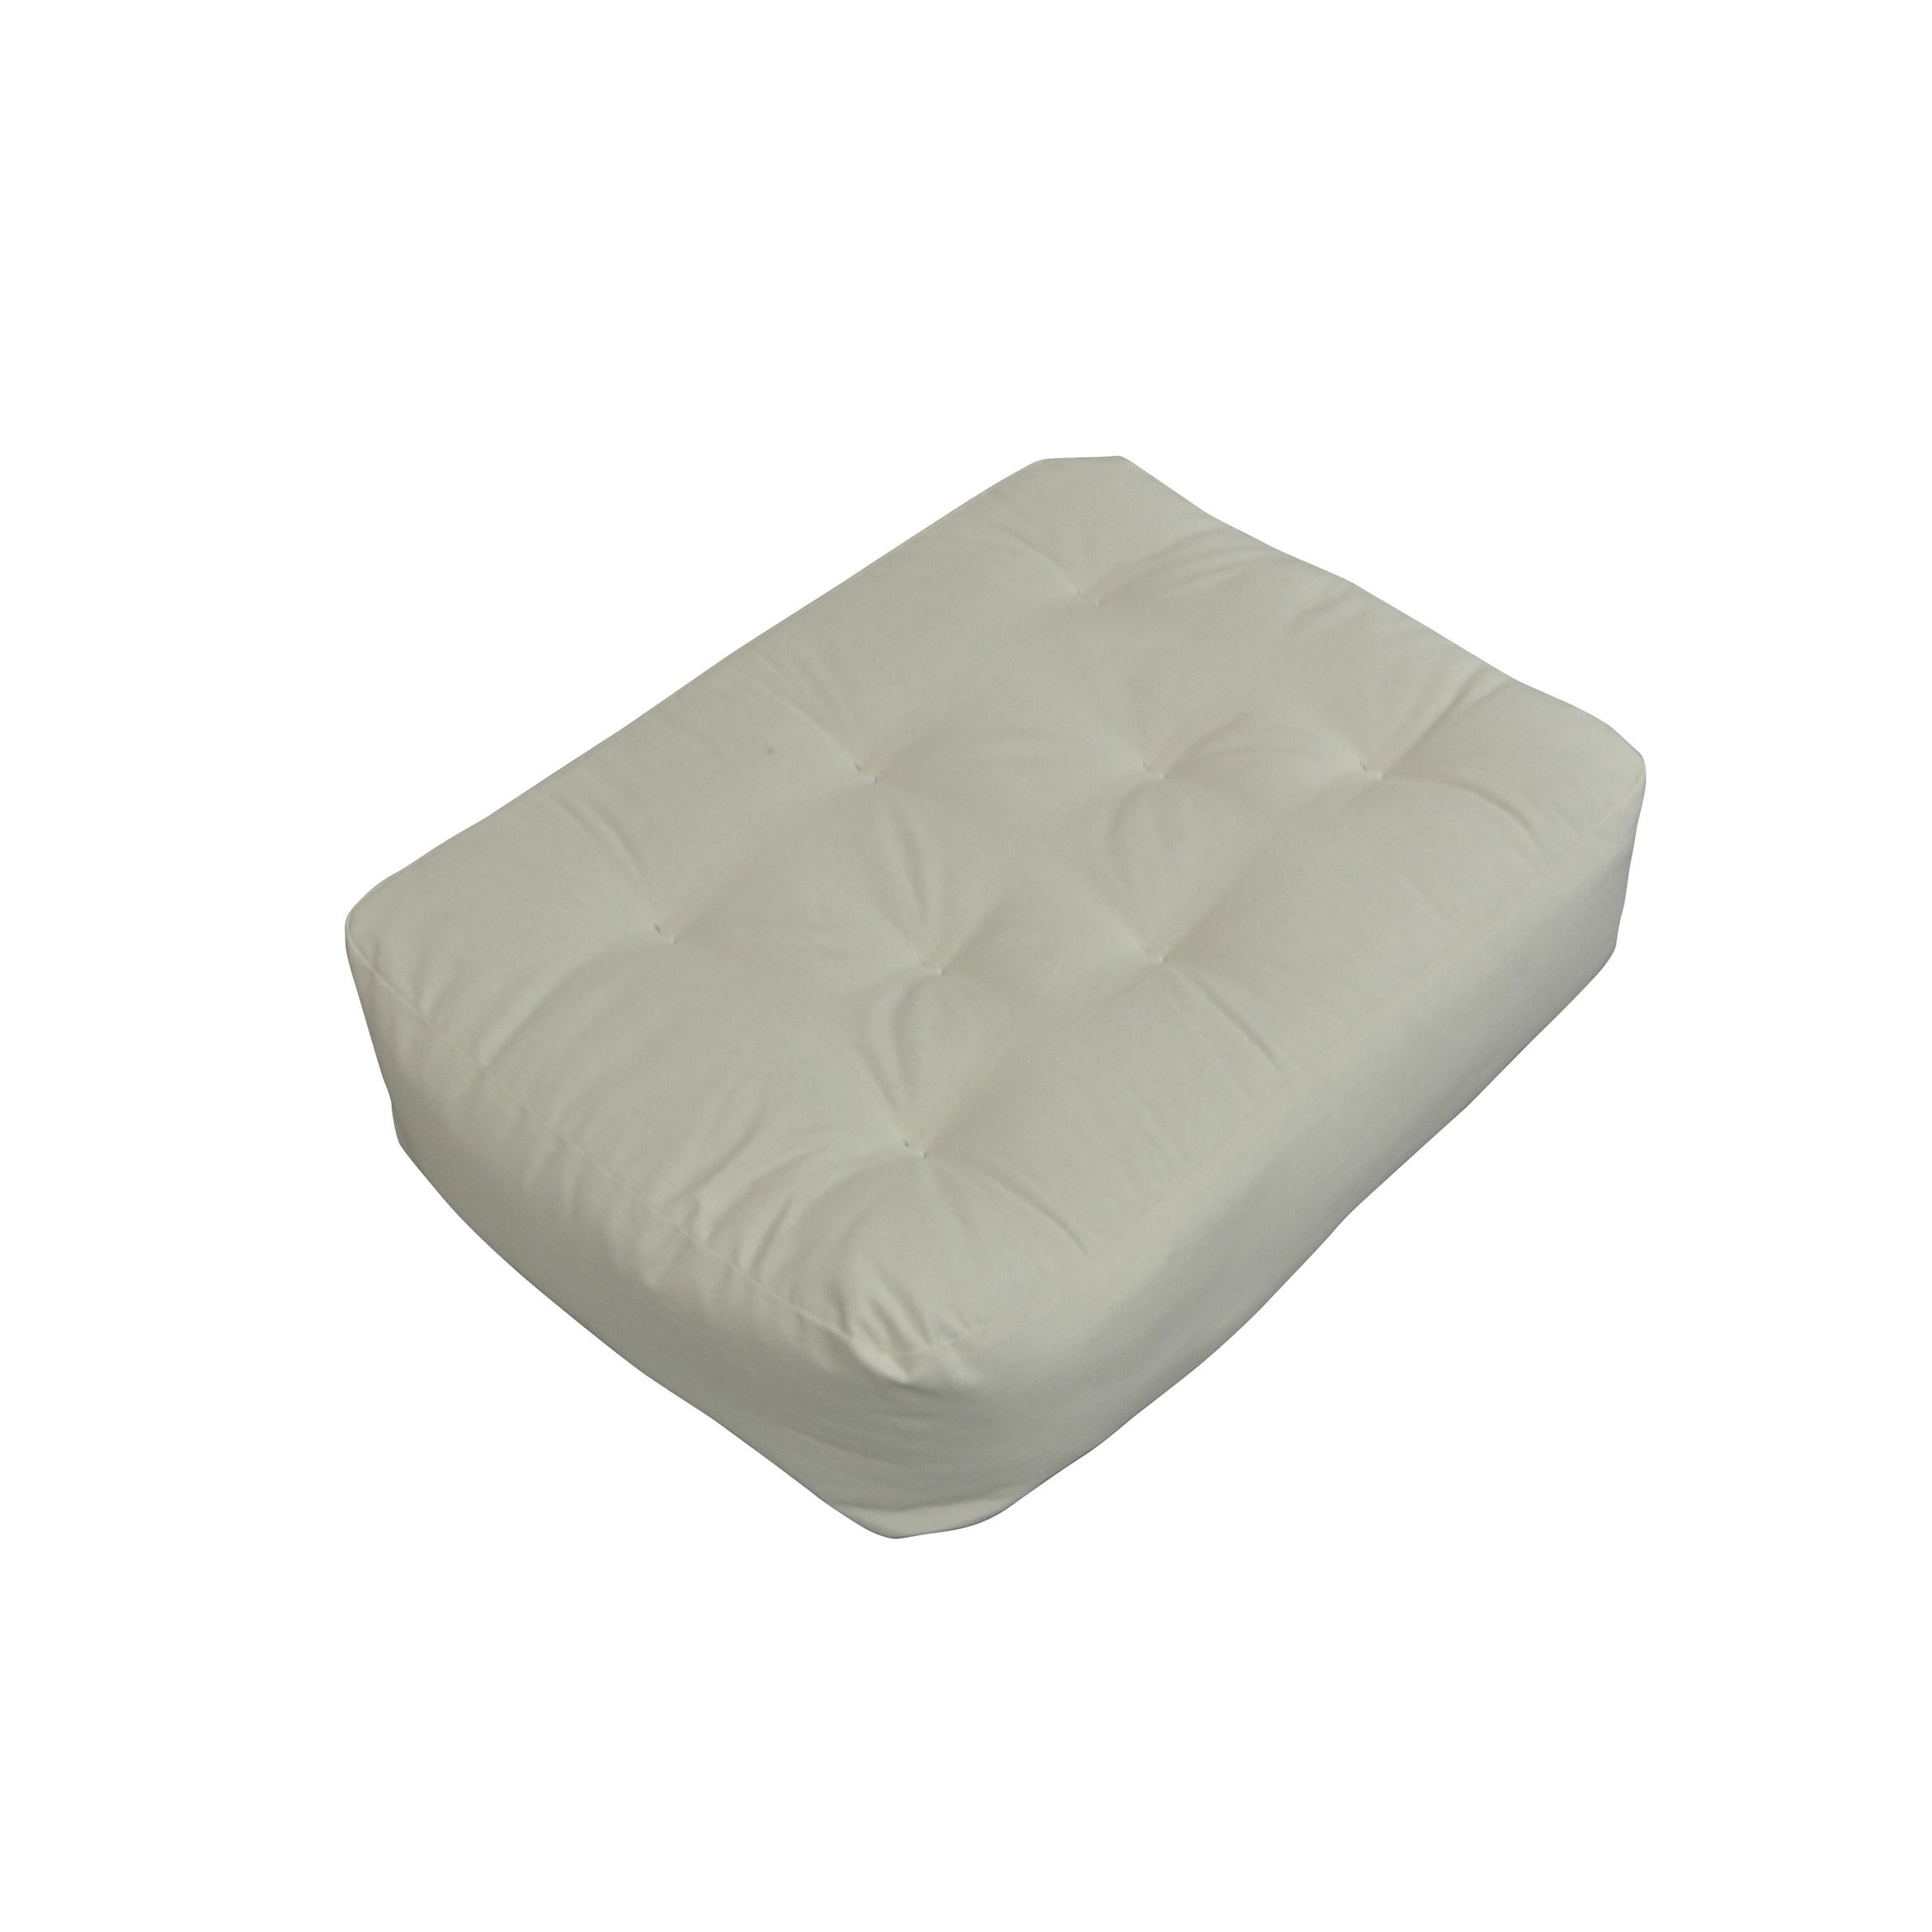 6 Single Foam Cotton 21x28 Chair Ottoman Natural Futon Mattress